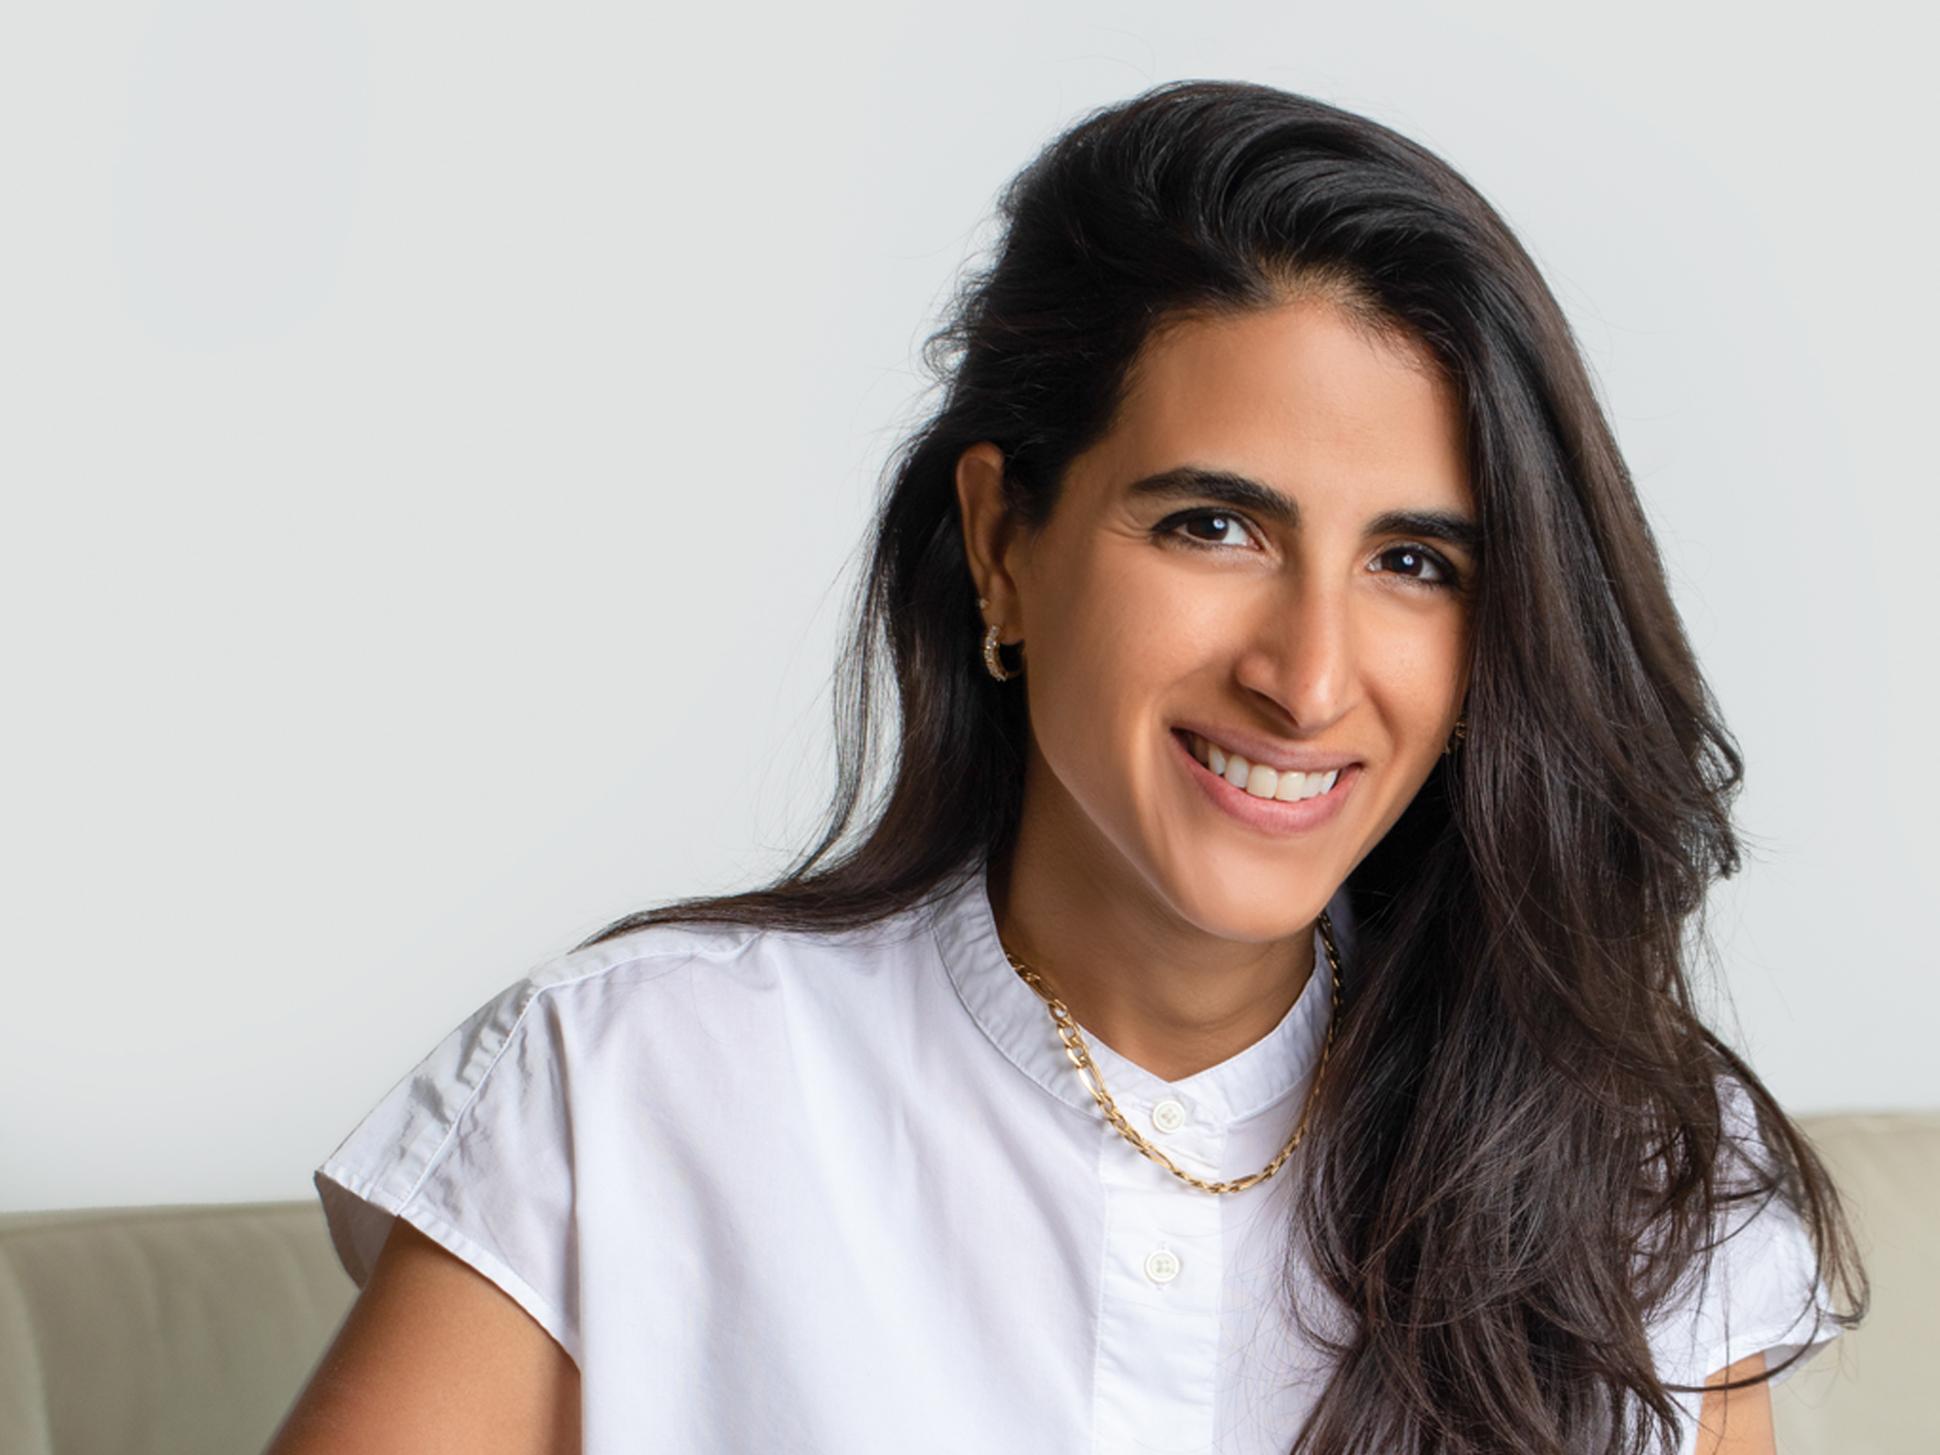 Z1 - Dalal Alrayes, Spare's Co-founder.